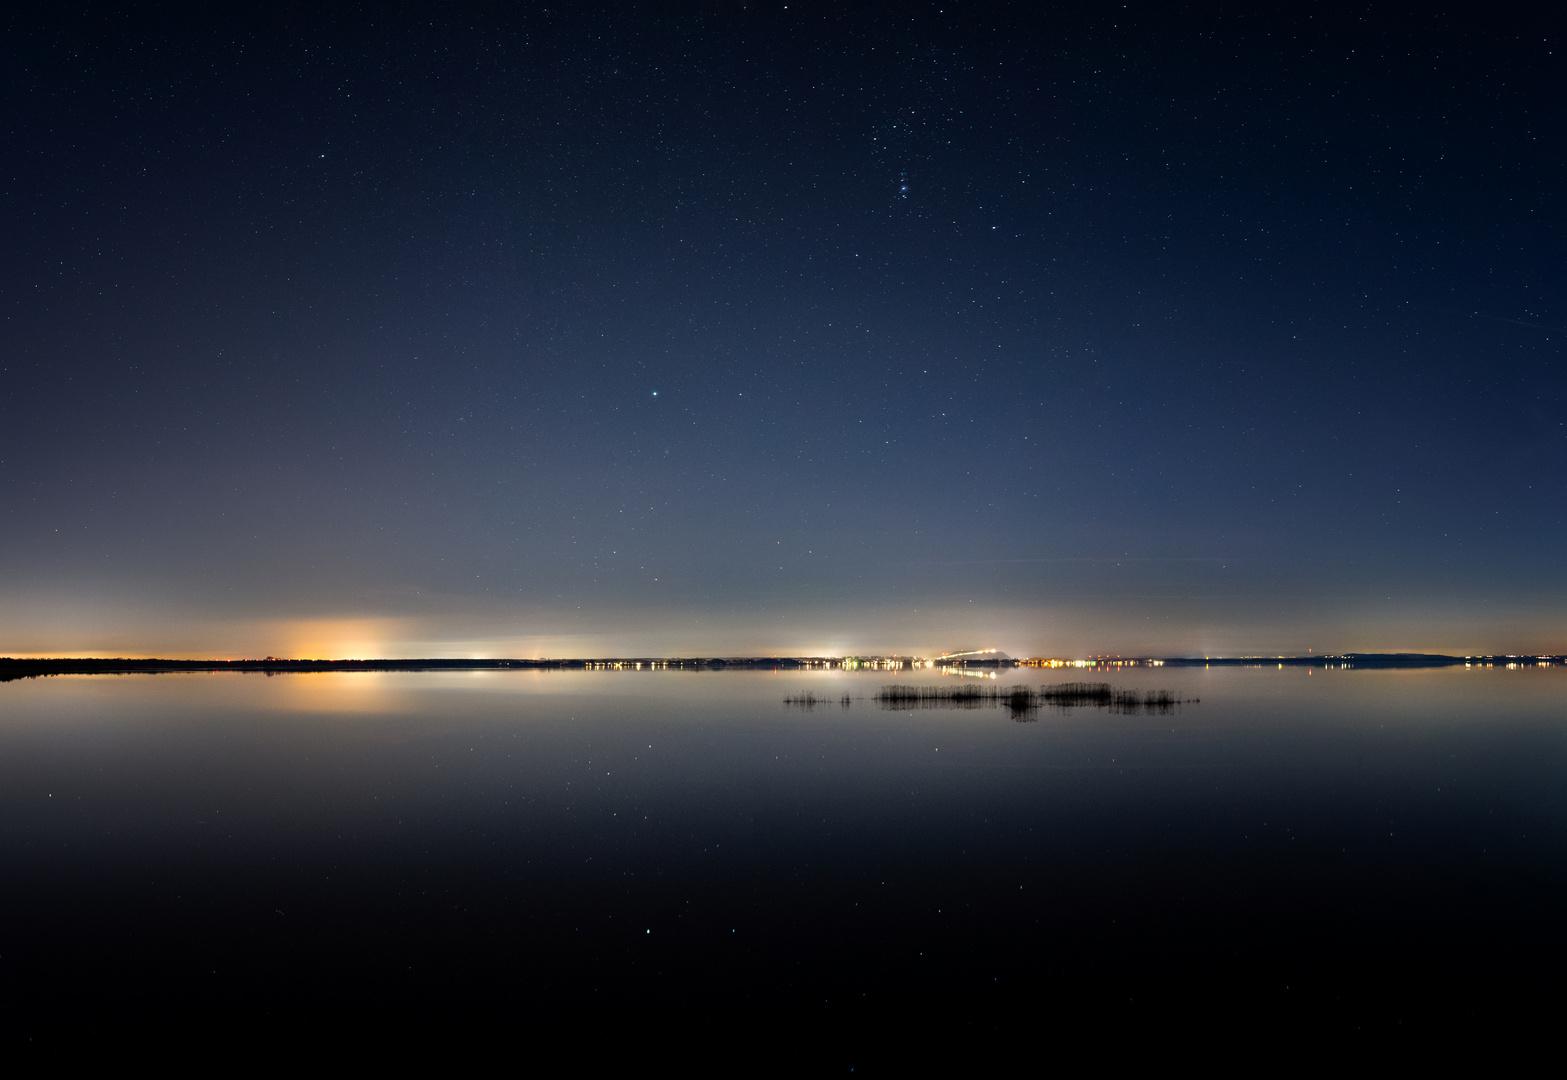 * Ein Meer voller Sterne *